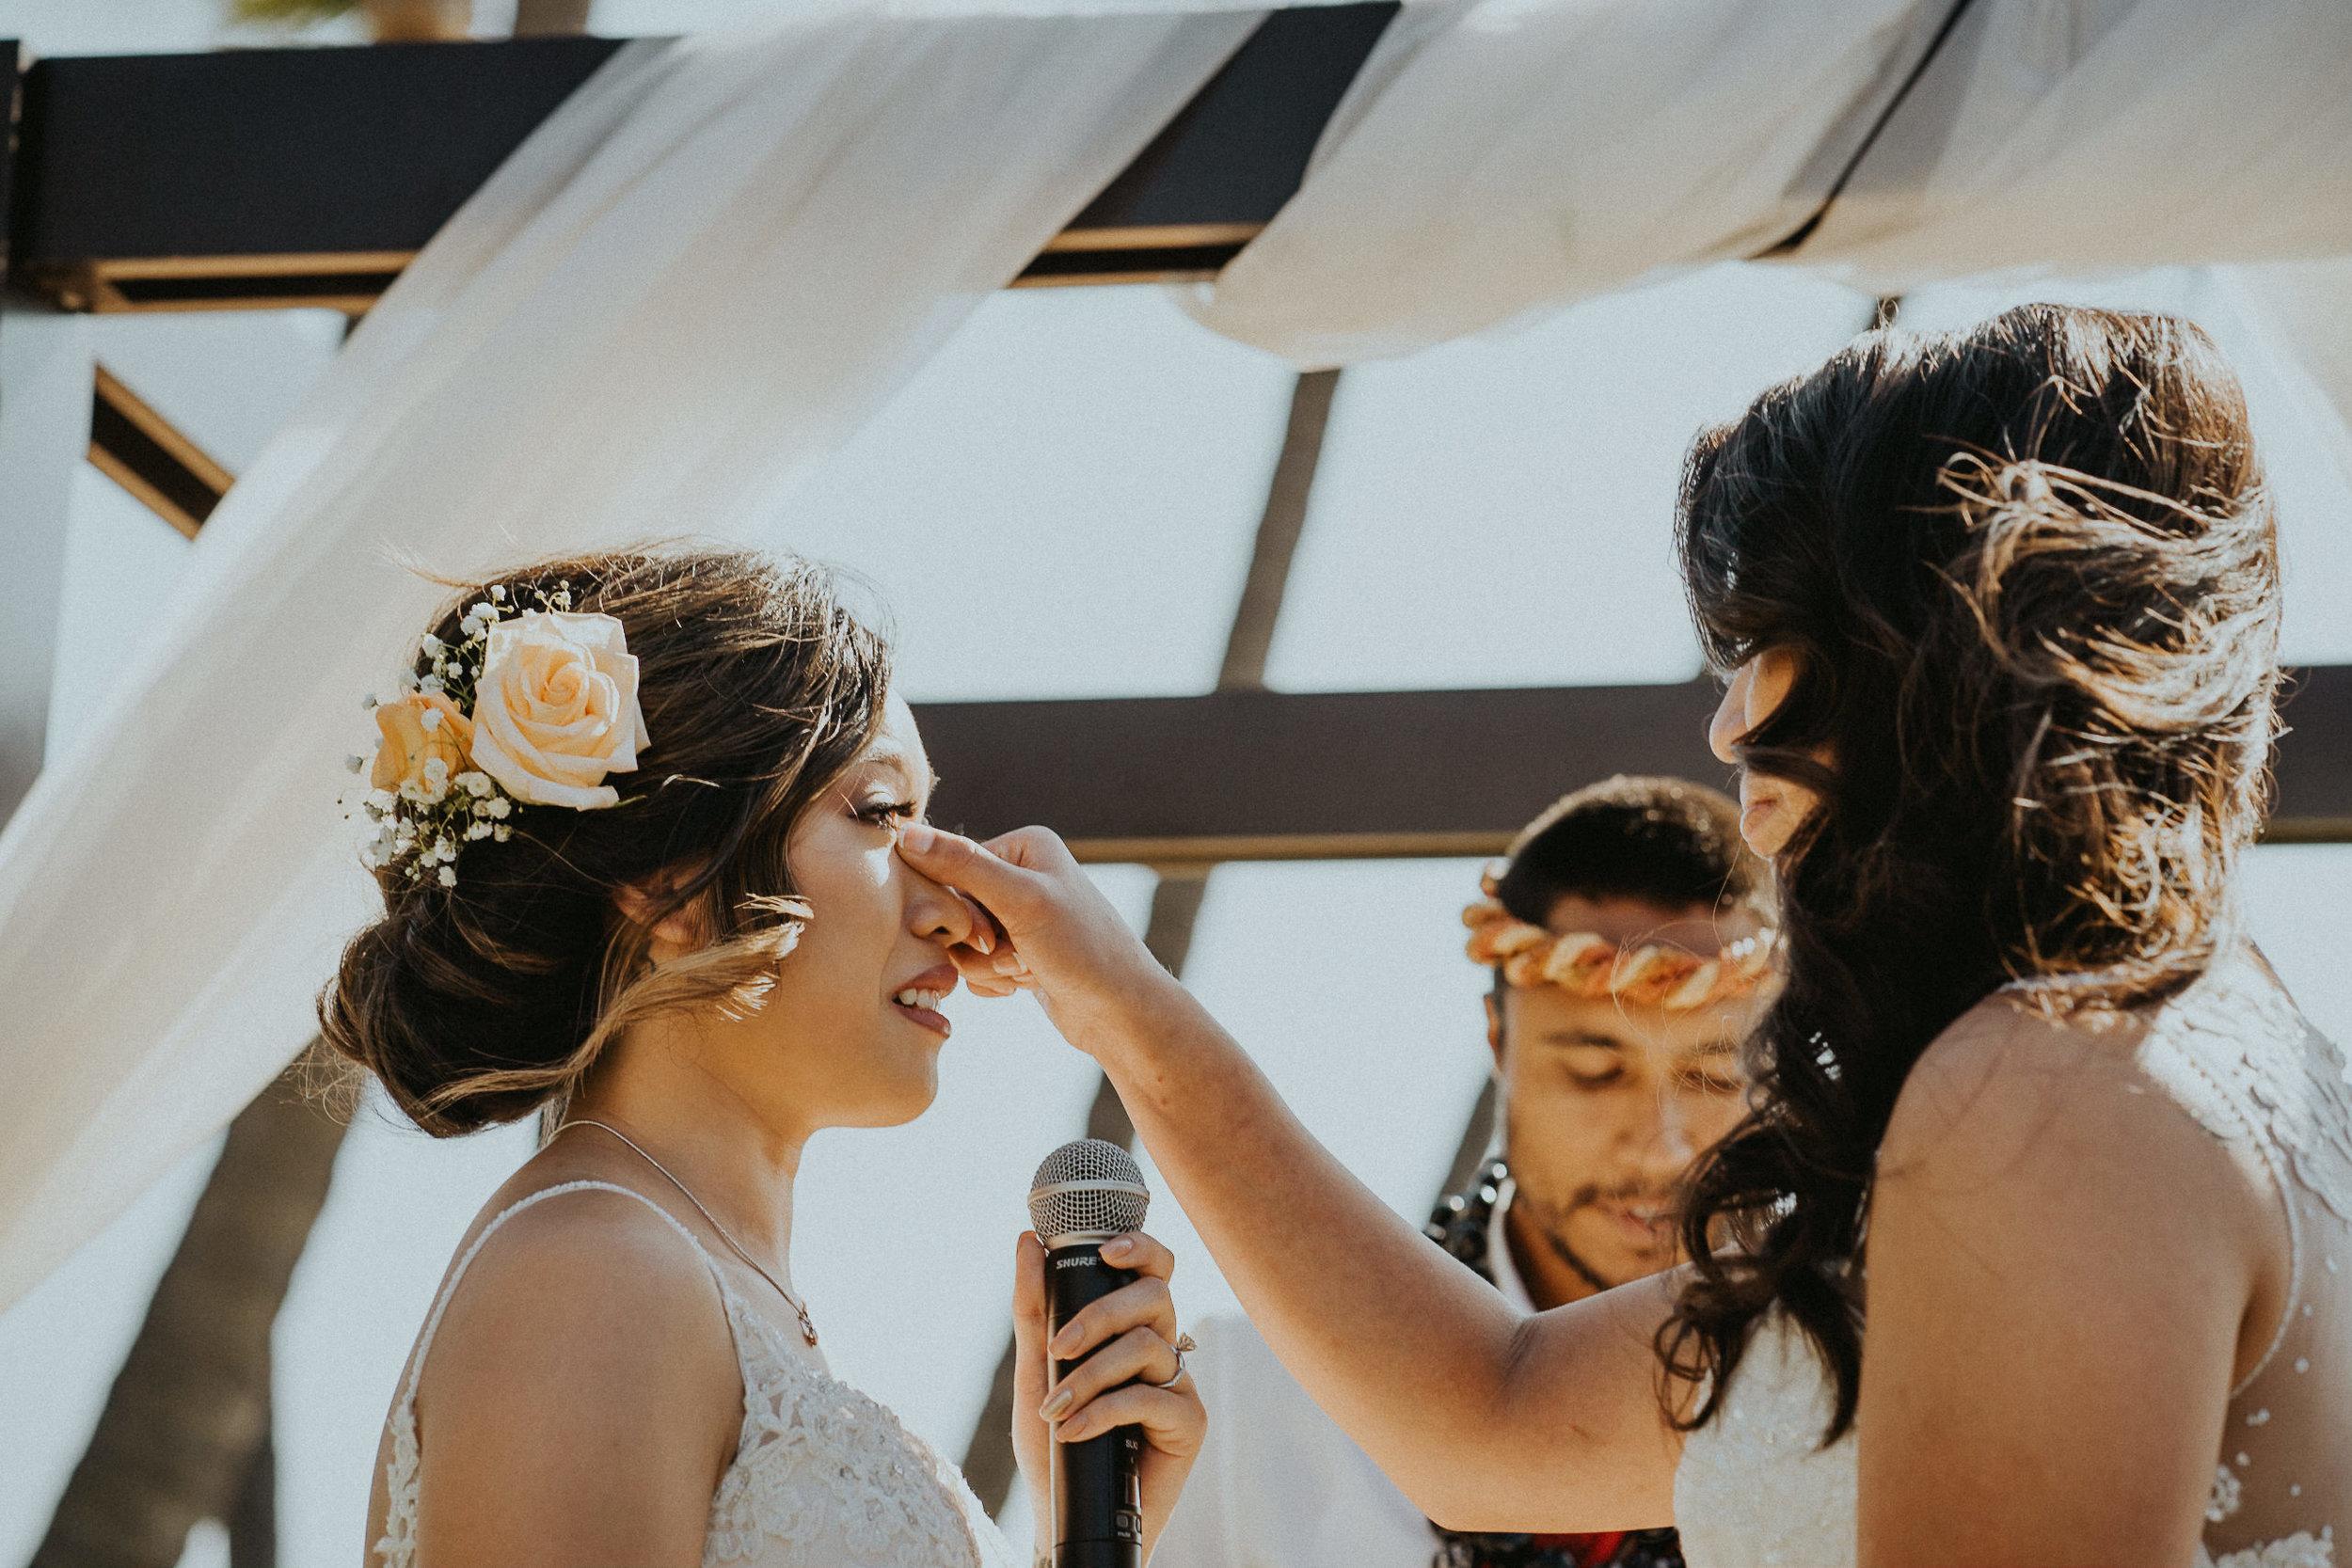 Maui_Destination_wedding_Alfred_Tang-12.jpg